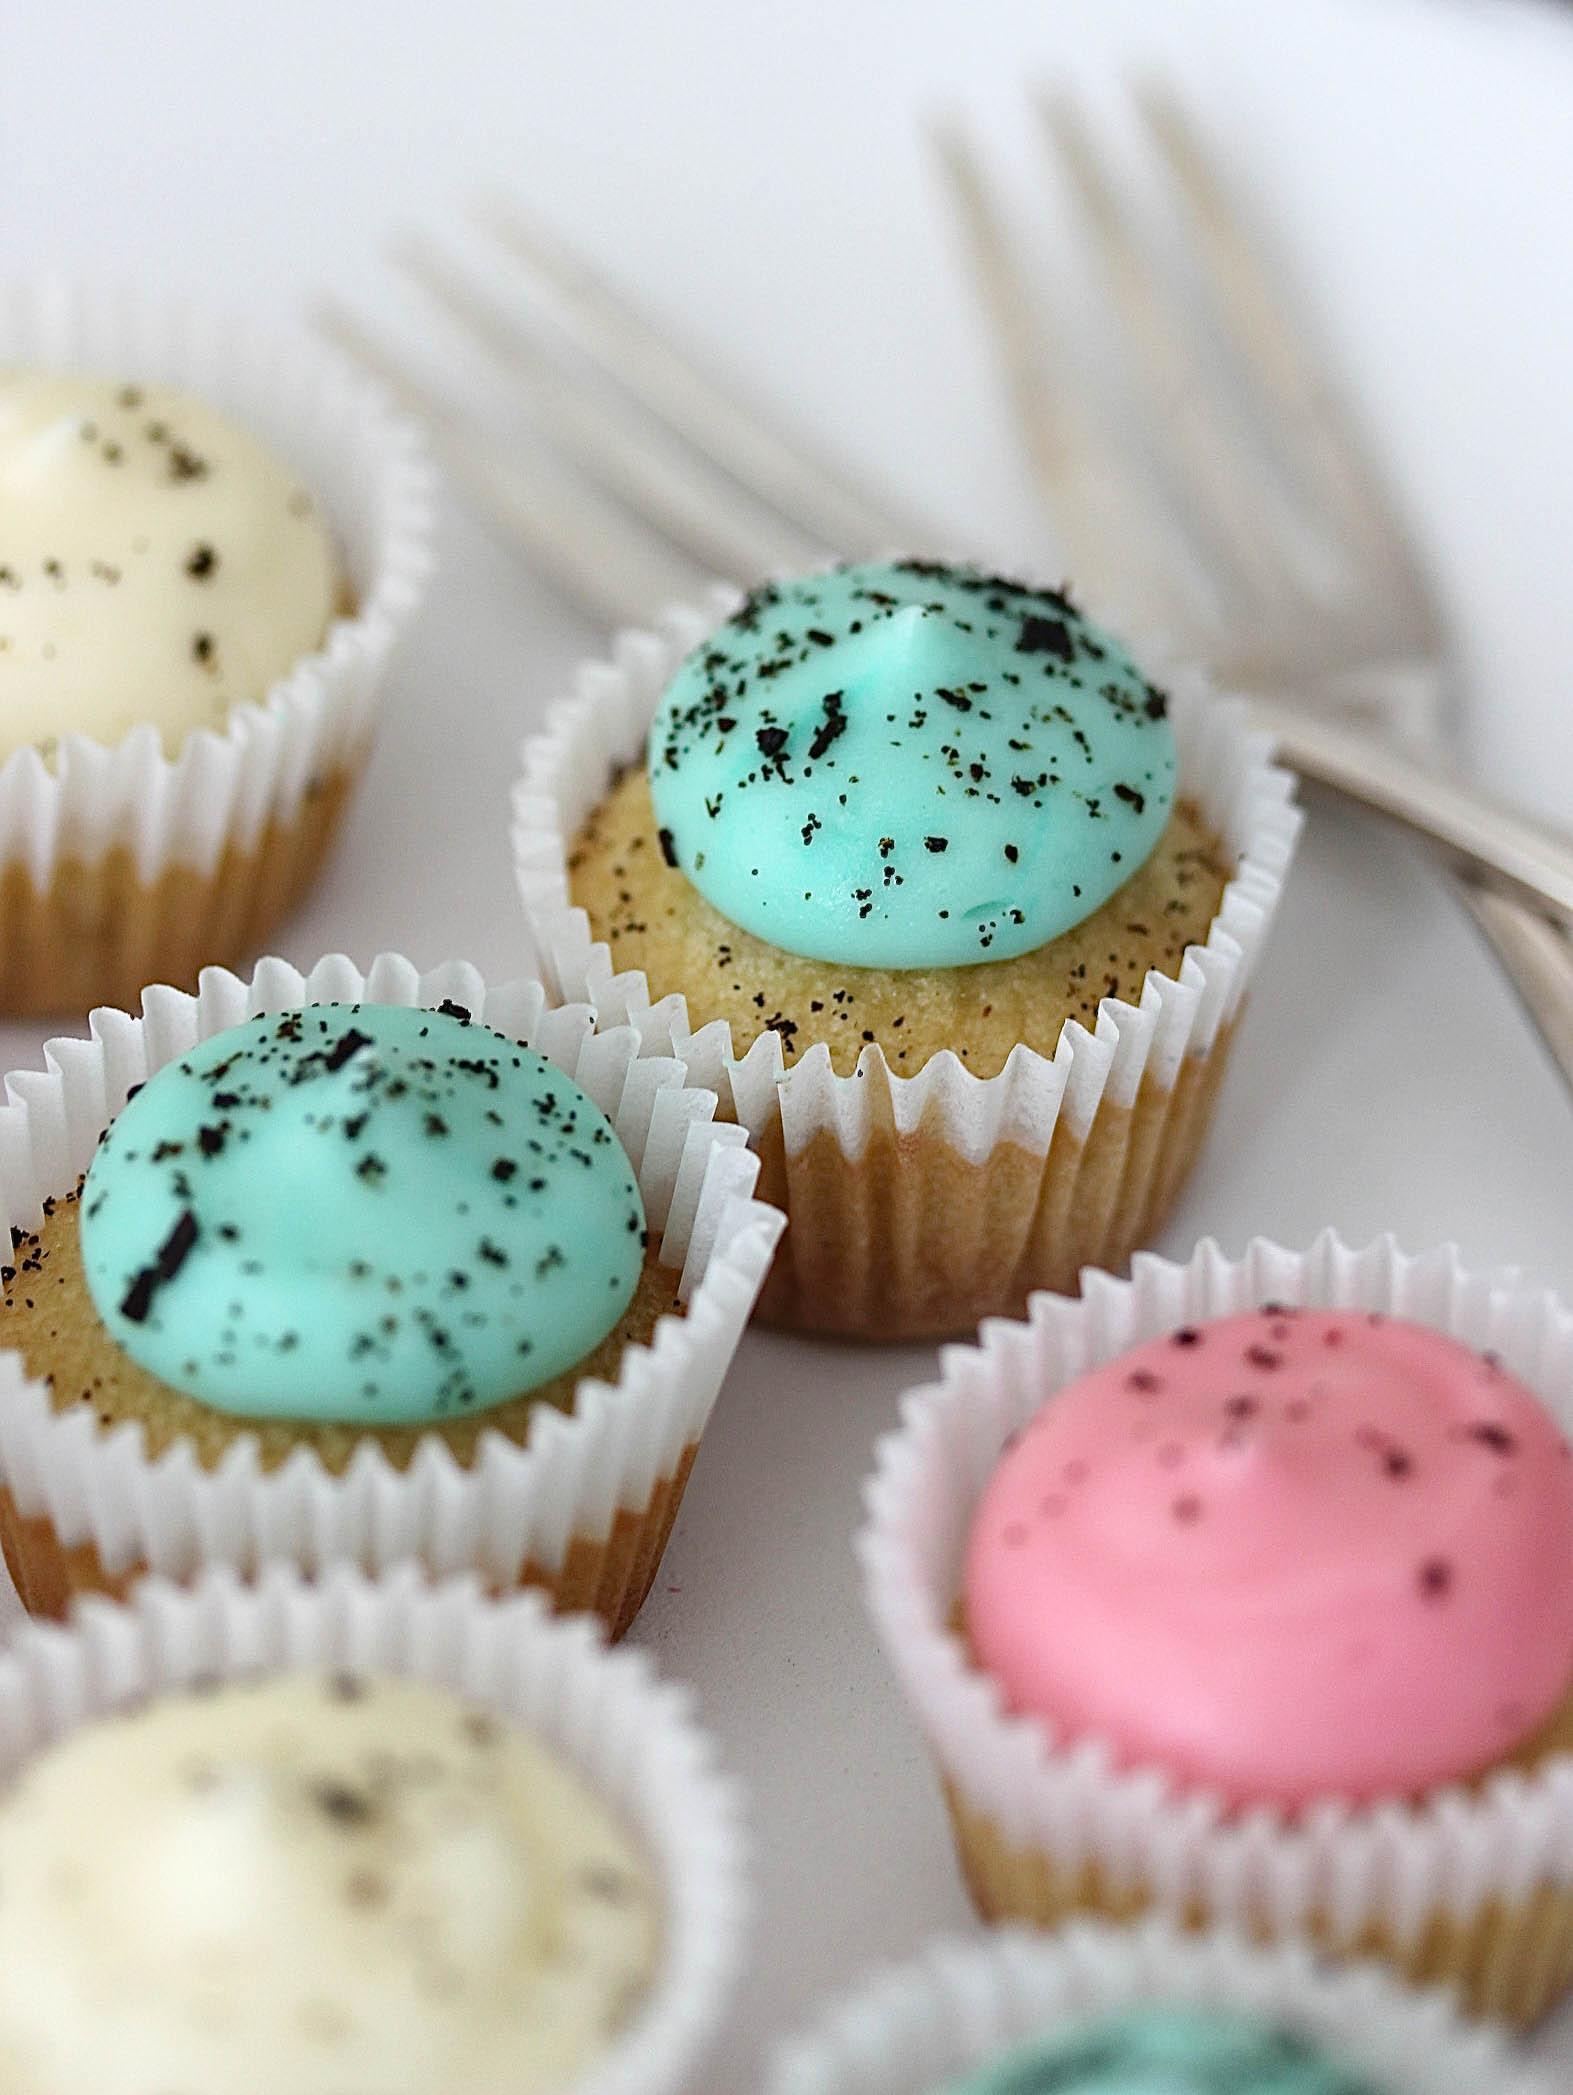 Süße Mini Vanille Cupcakes mit pastelligem Frosting Rezept Ostern Babyparty Babyshower Kindergeburtstag backen #cupcakes #ostern #babyshower #kindergeburtstag Backblog Foodfotografie Foodblog | Emma´s Lieblingsstücke